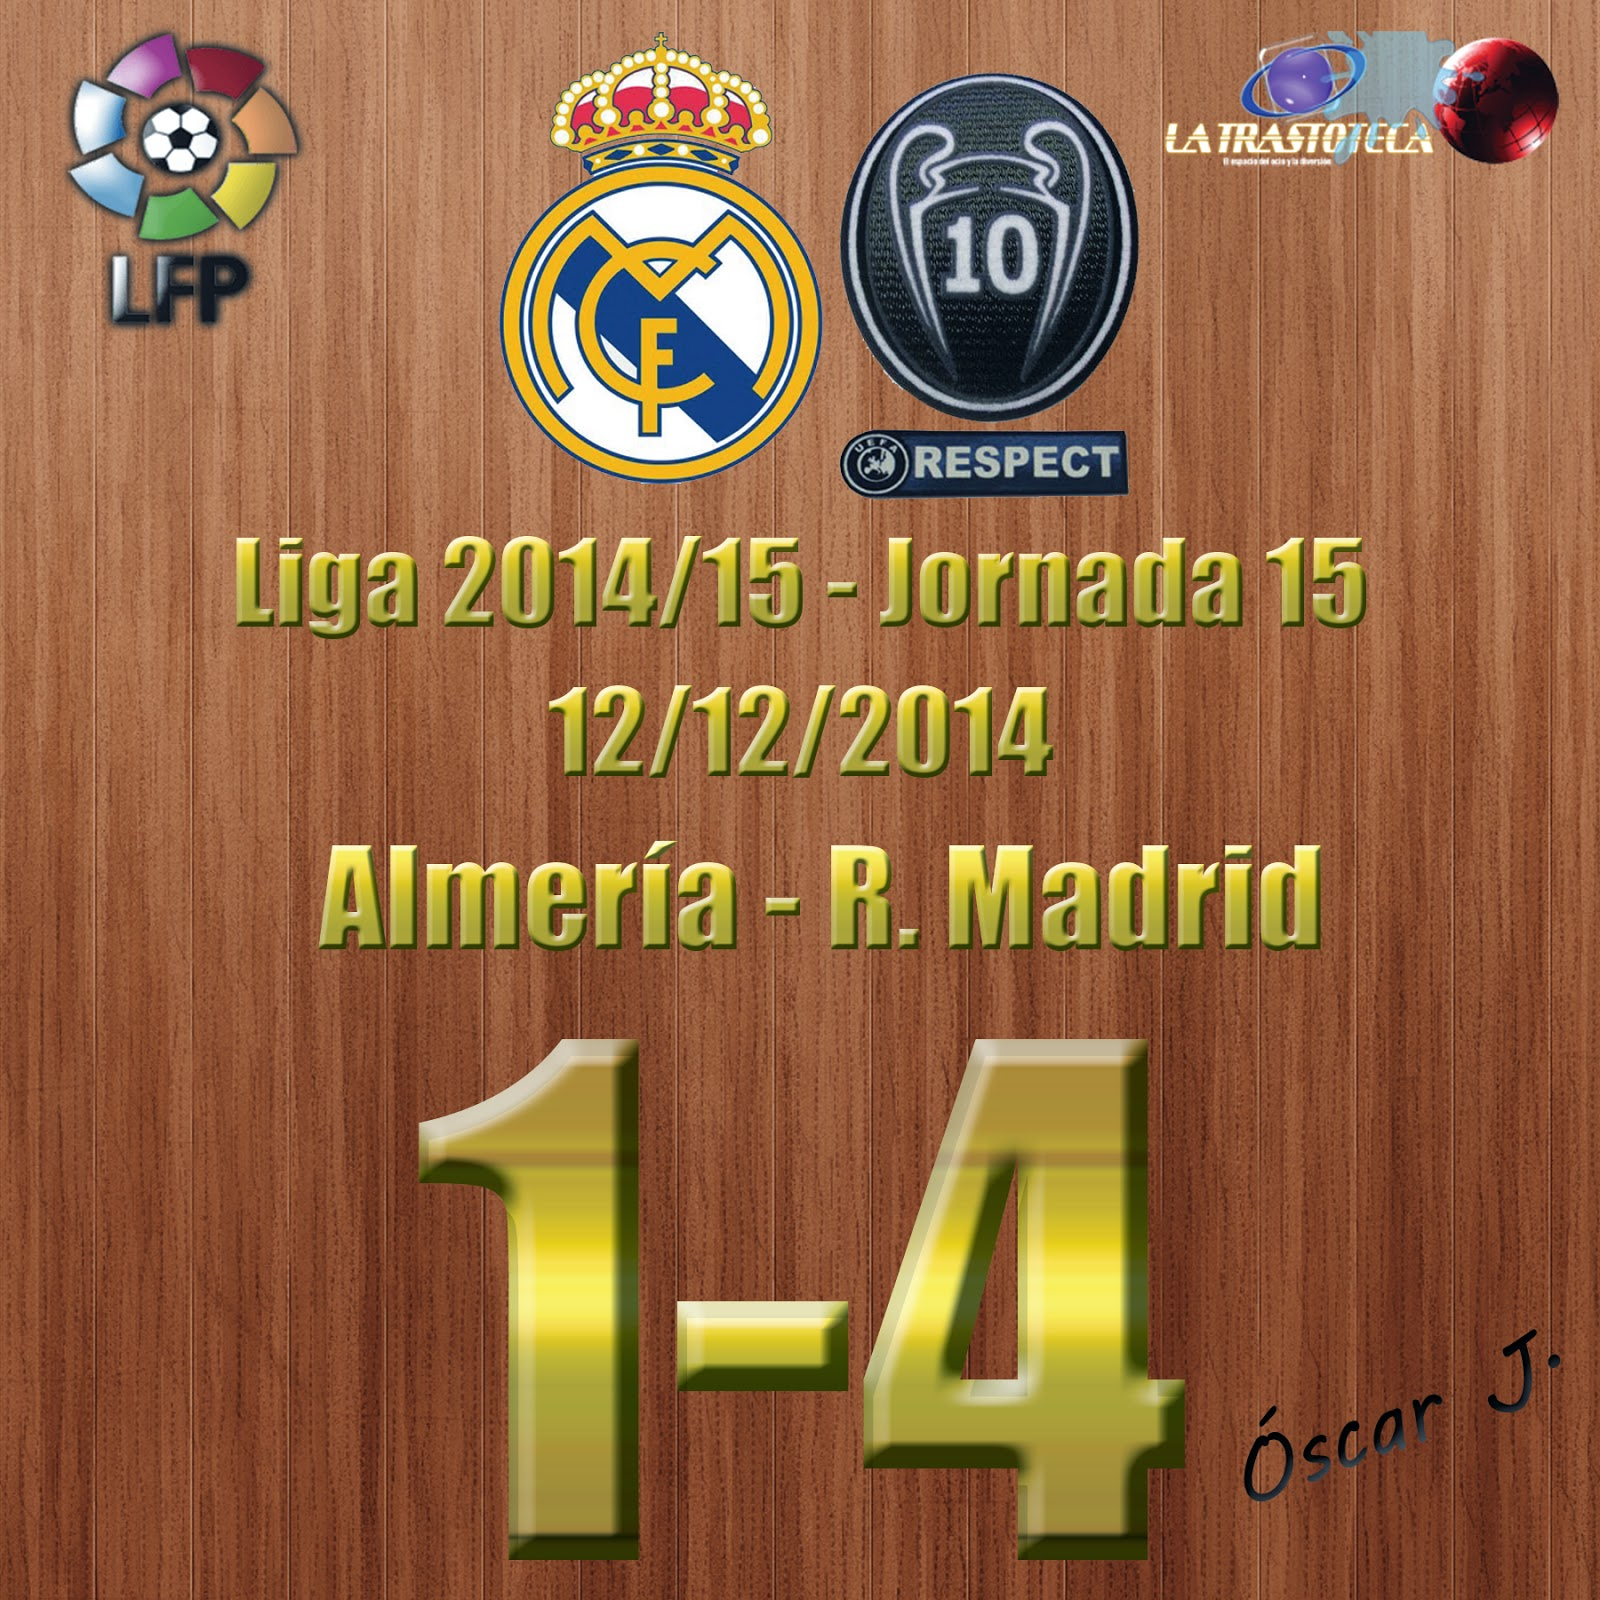 Gareth Bale (0-2) - Almería 1-4 Real Madrid - Liga 2014/15 - Jornada 15 - (12/12/2014)